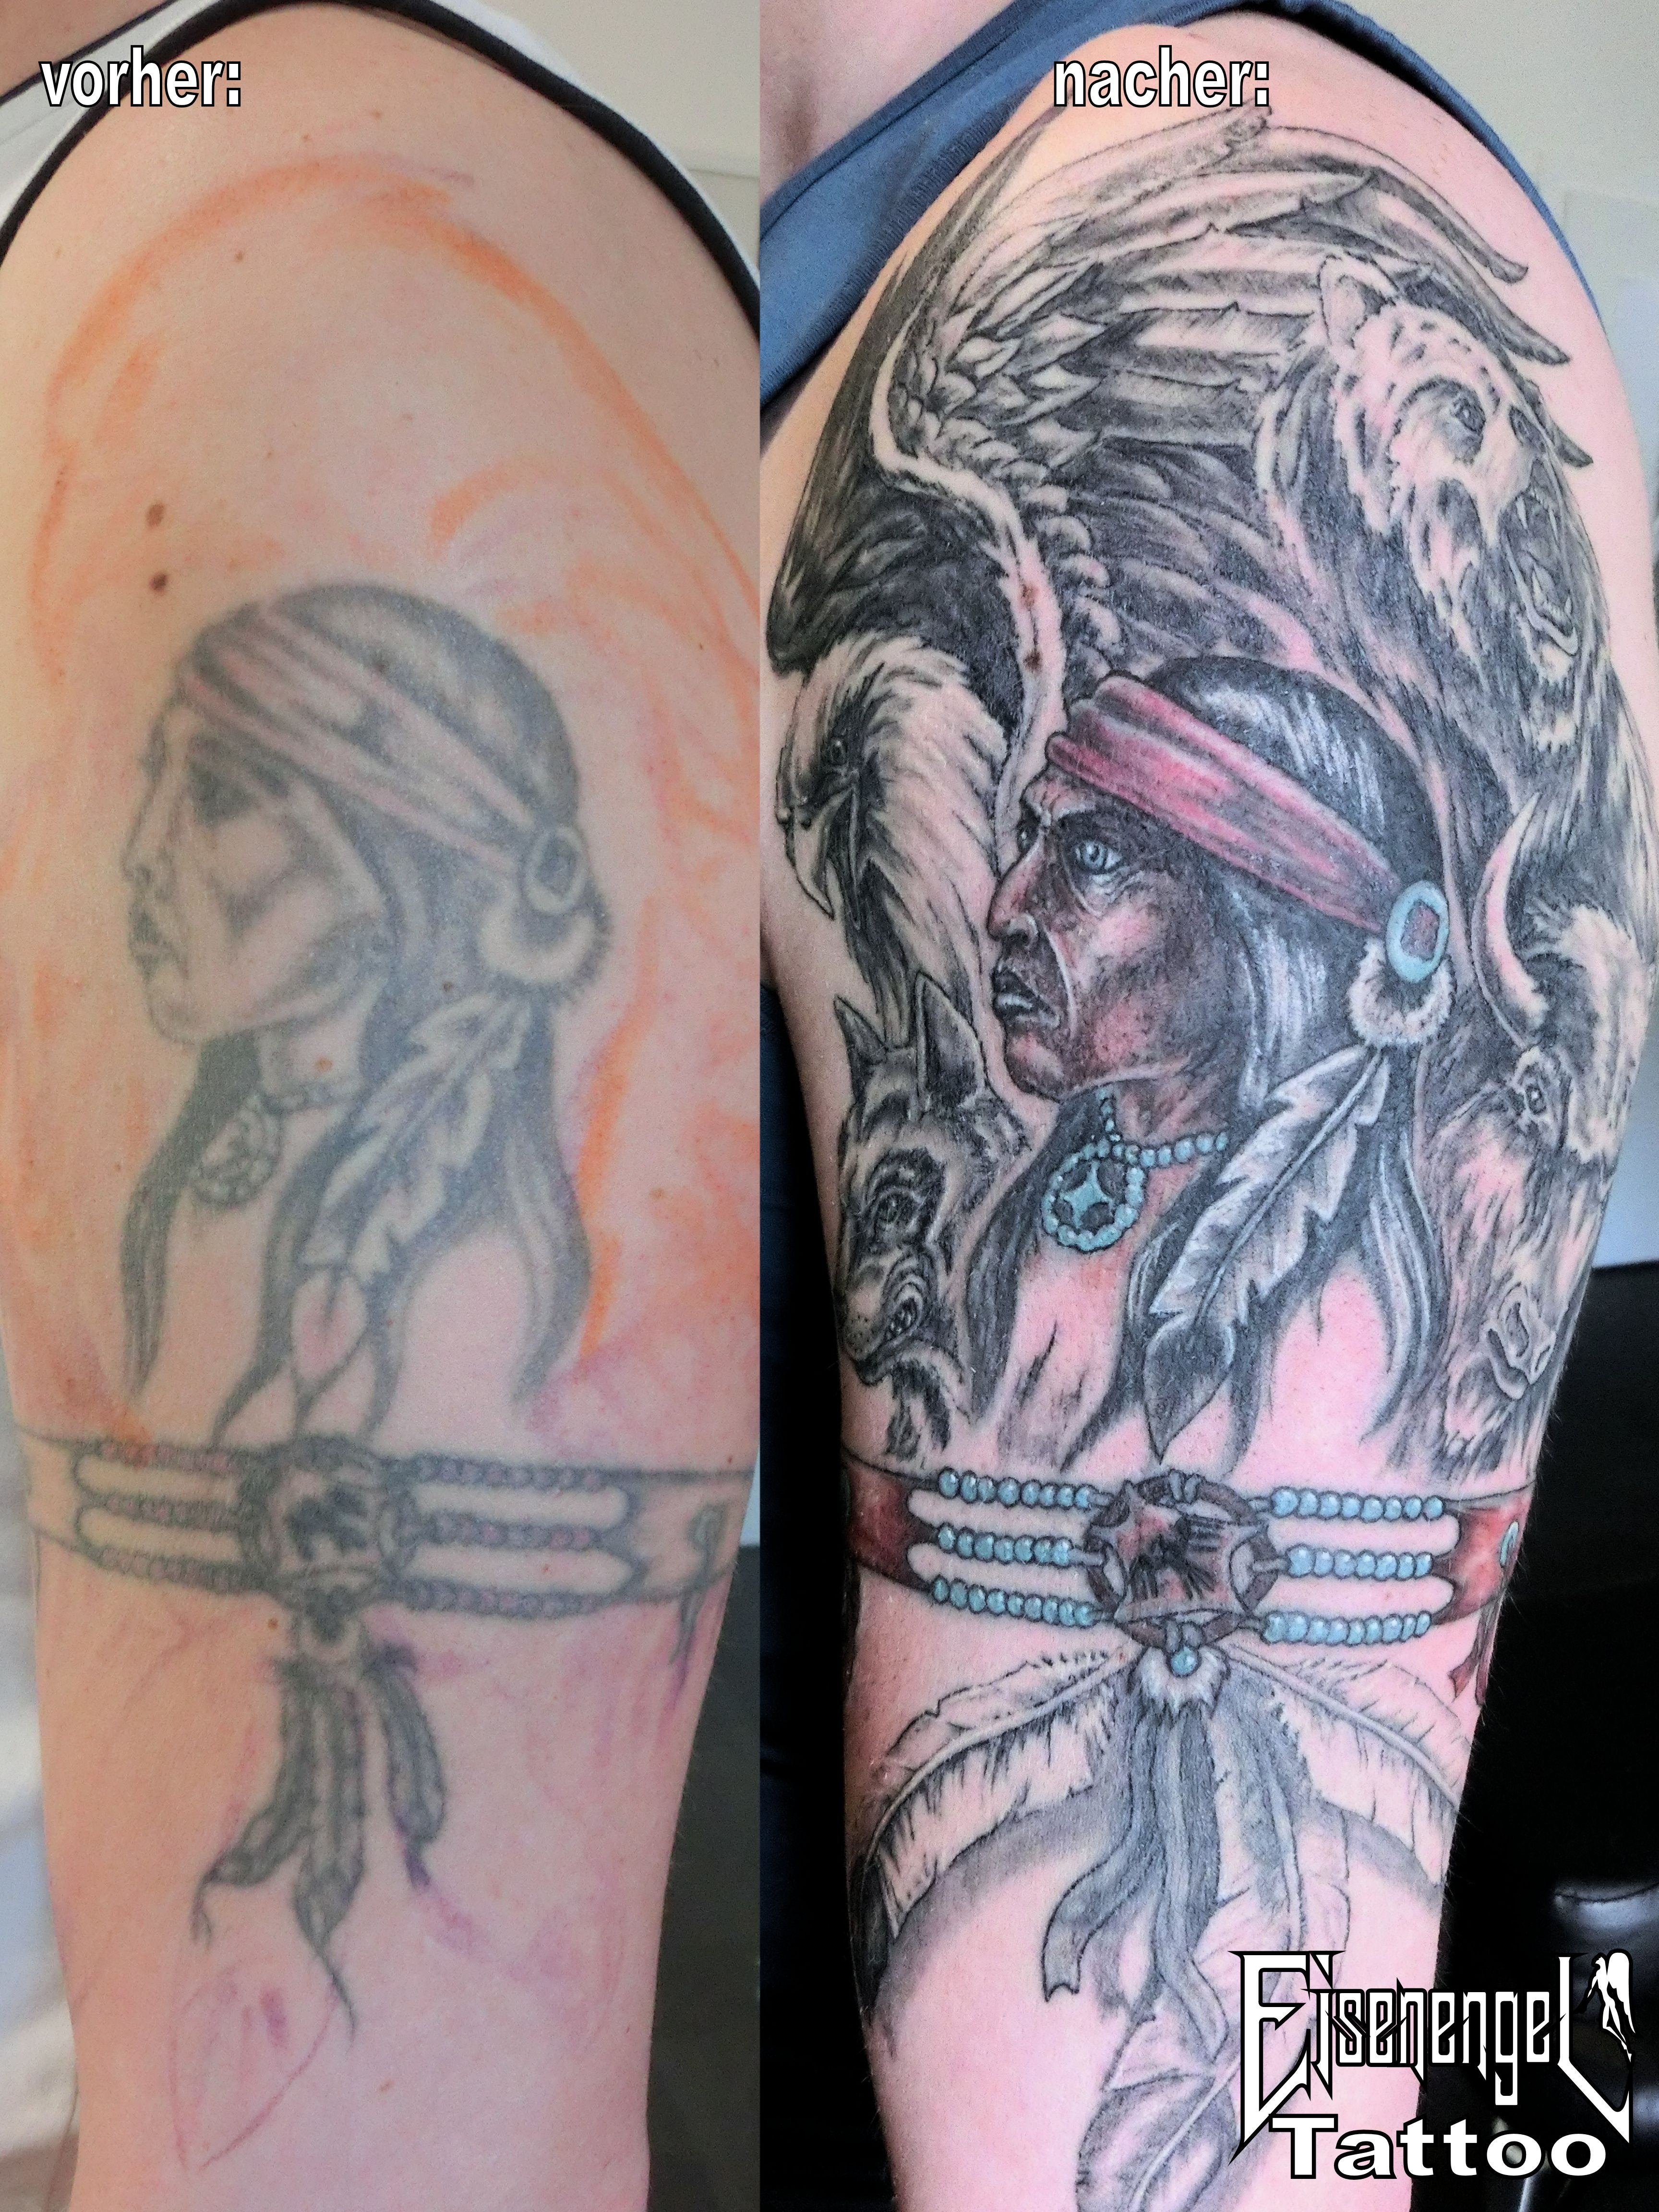 tattoo_coverup_indianer.jpg